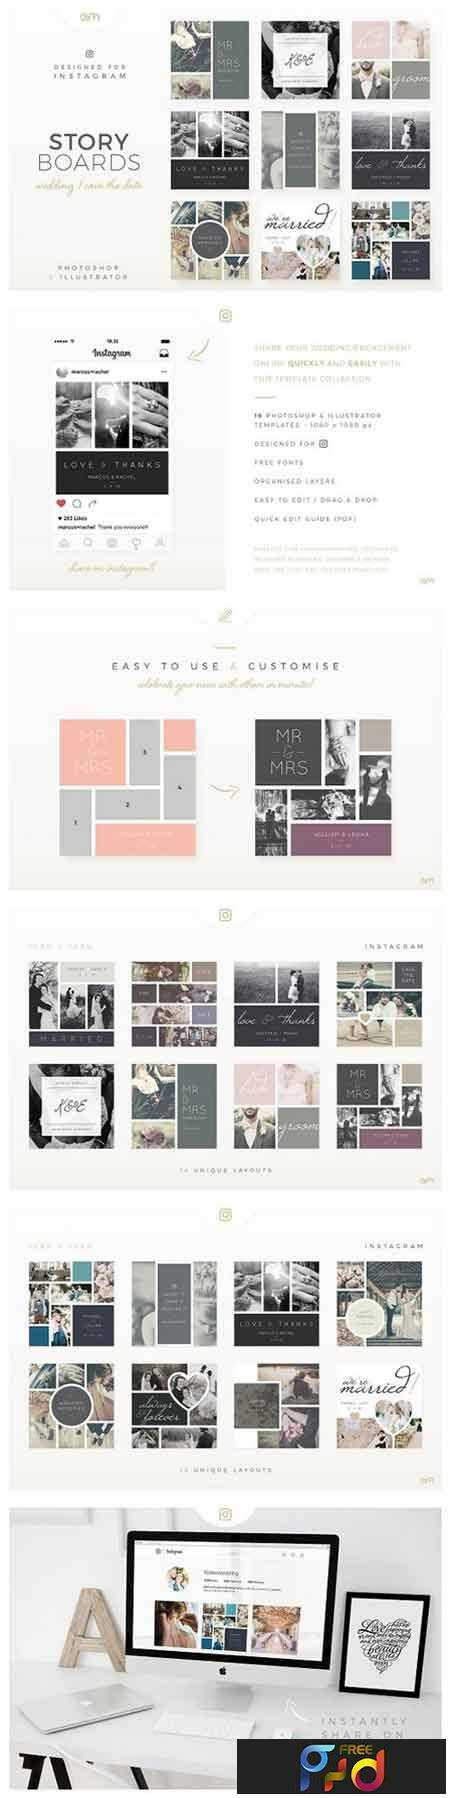 FreePsdVn.com_1705180_TEMPLATE_storyboards_wedding_1289408